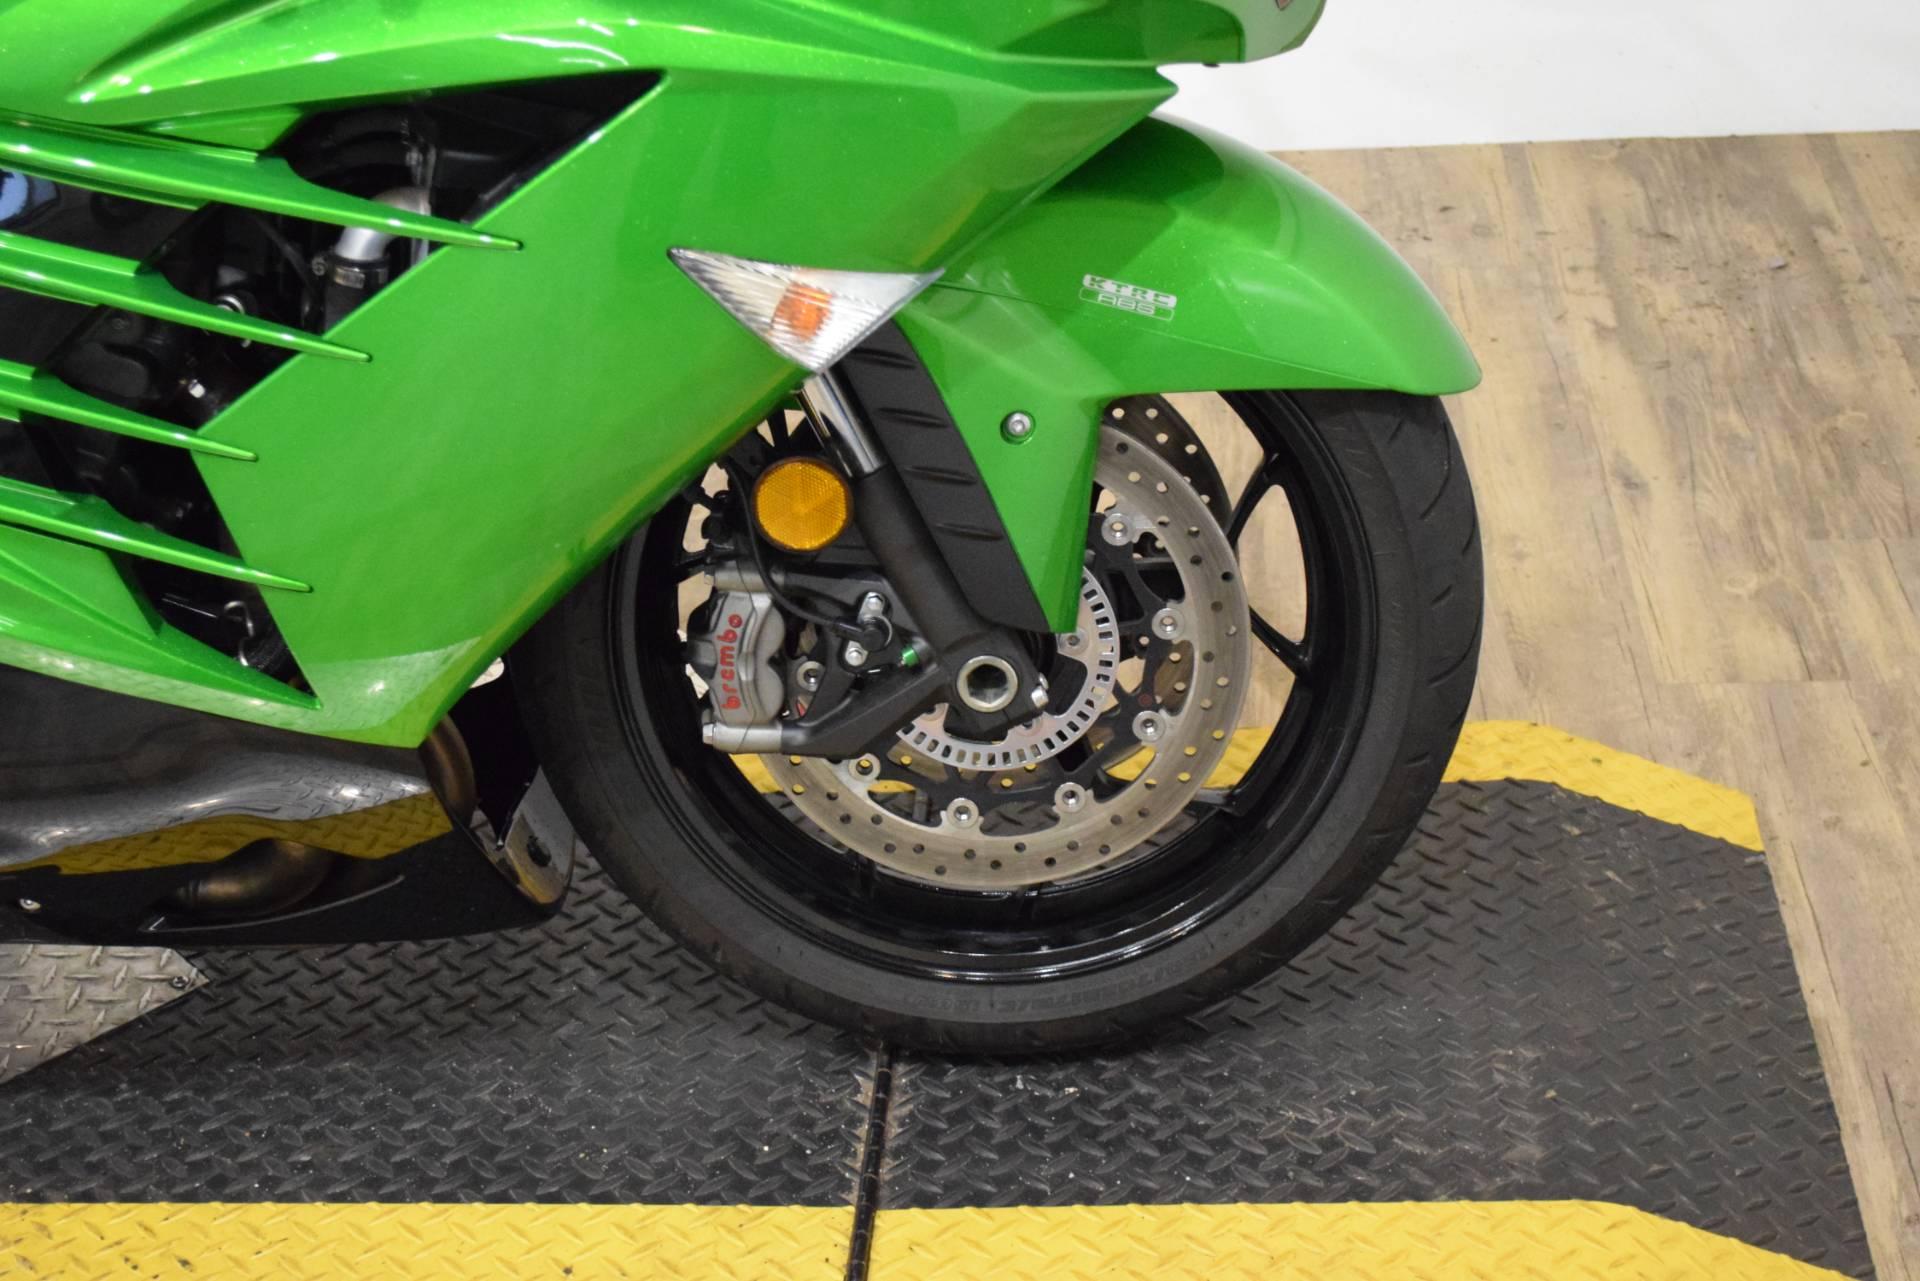 2017 Kawasaki Ninja Zx 14r Abs Se In Wauconda Illinois